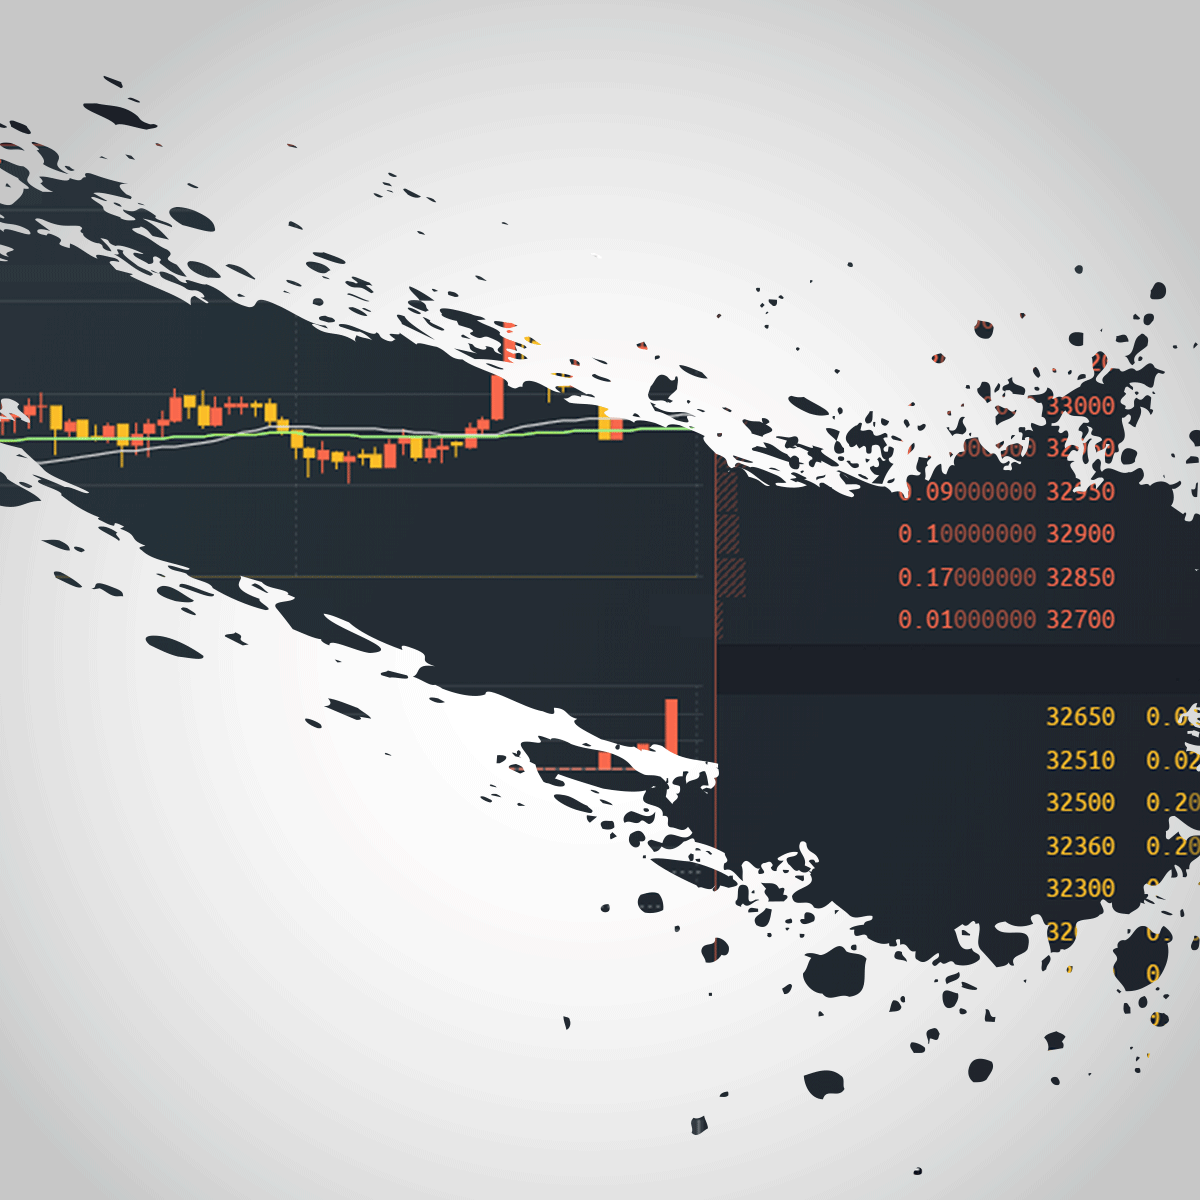 test ツイッターメディア - bitFlyerの最終取引価格 = ¥974,479 best_bid = ¥974,086 best_ask = ¥974,479 (2020年07月16日 19時38分40秒) #ビットフライヤー https://t.co/xsoYpHlCun